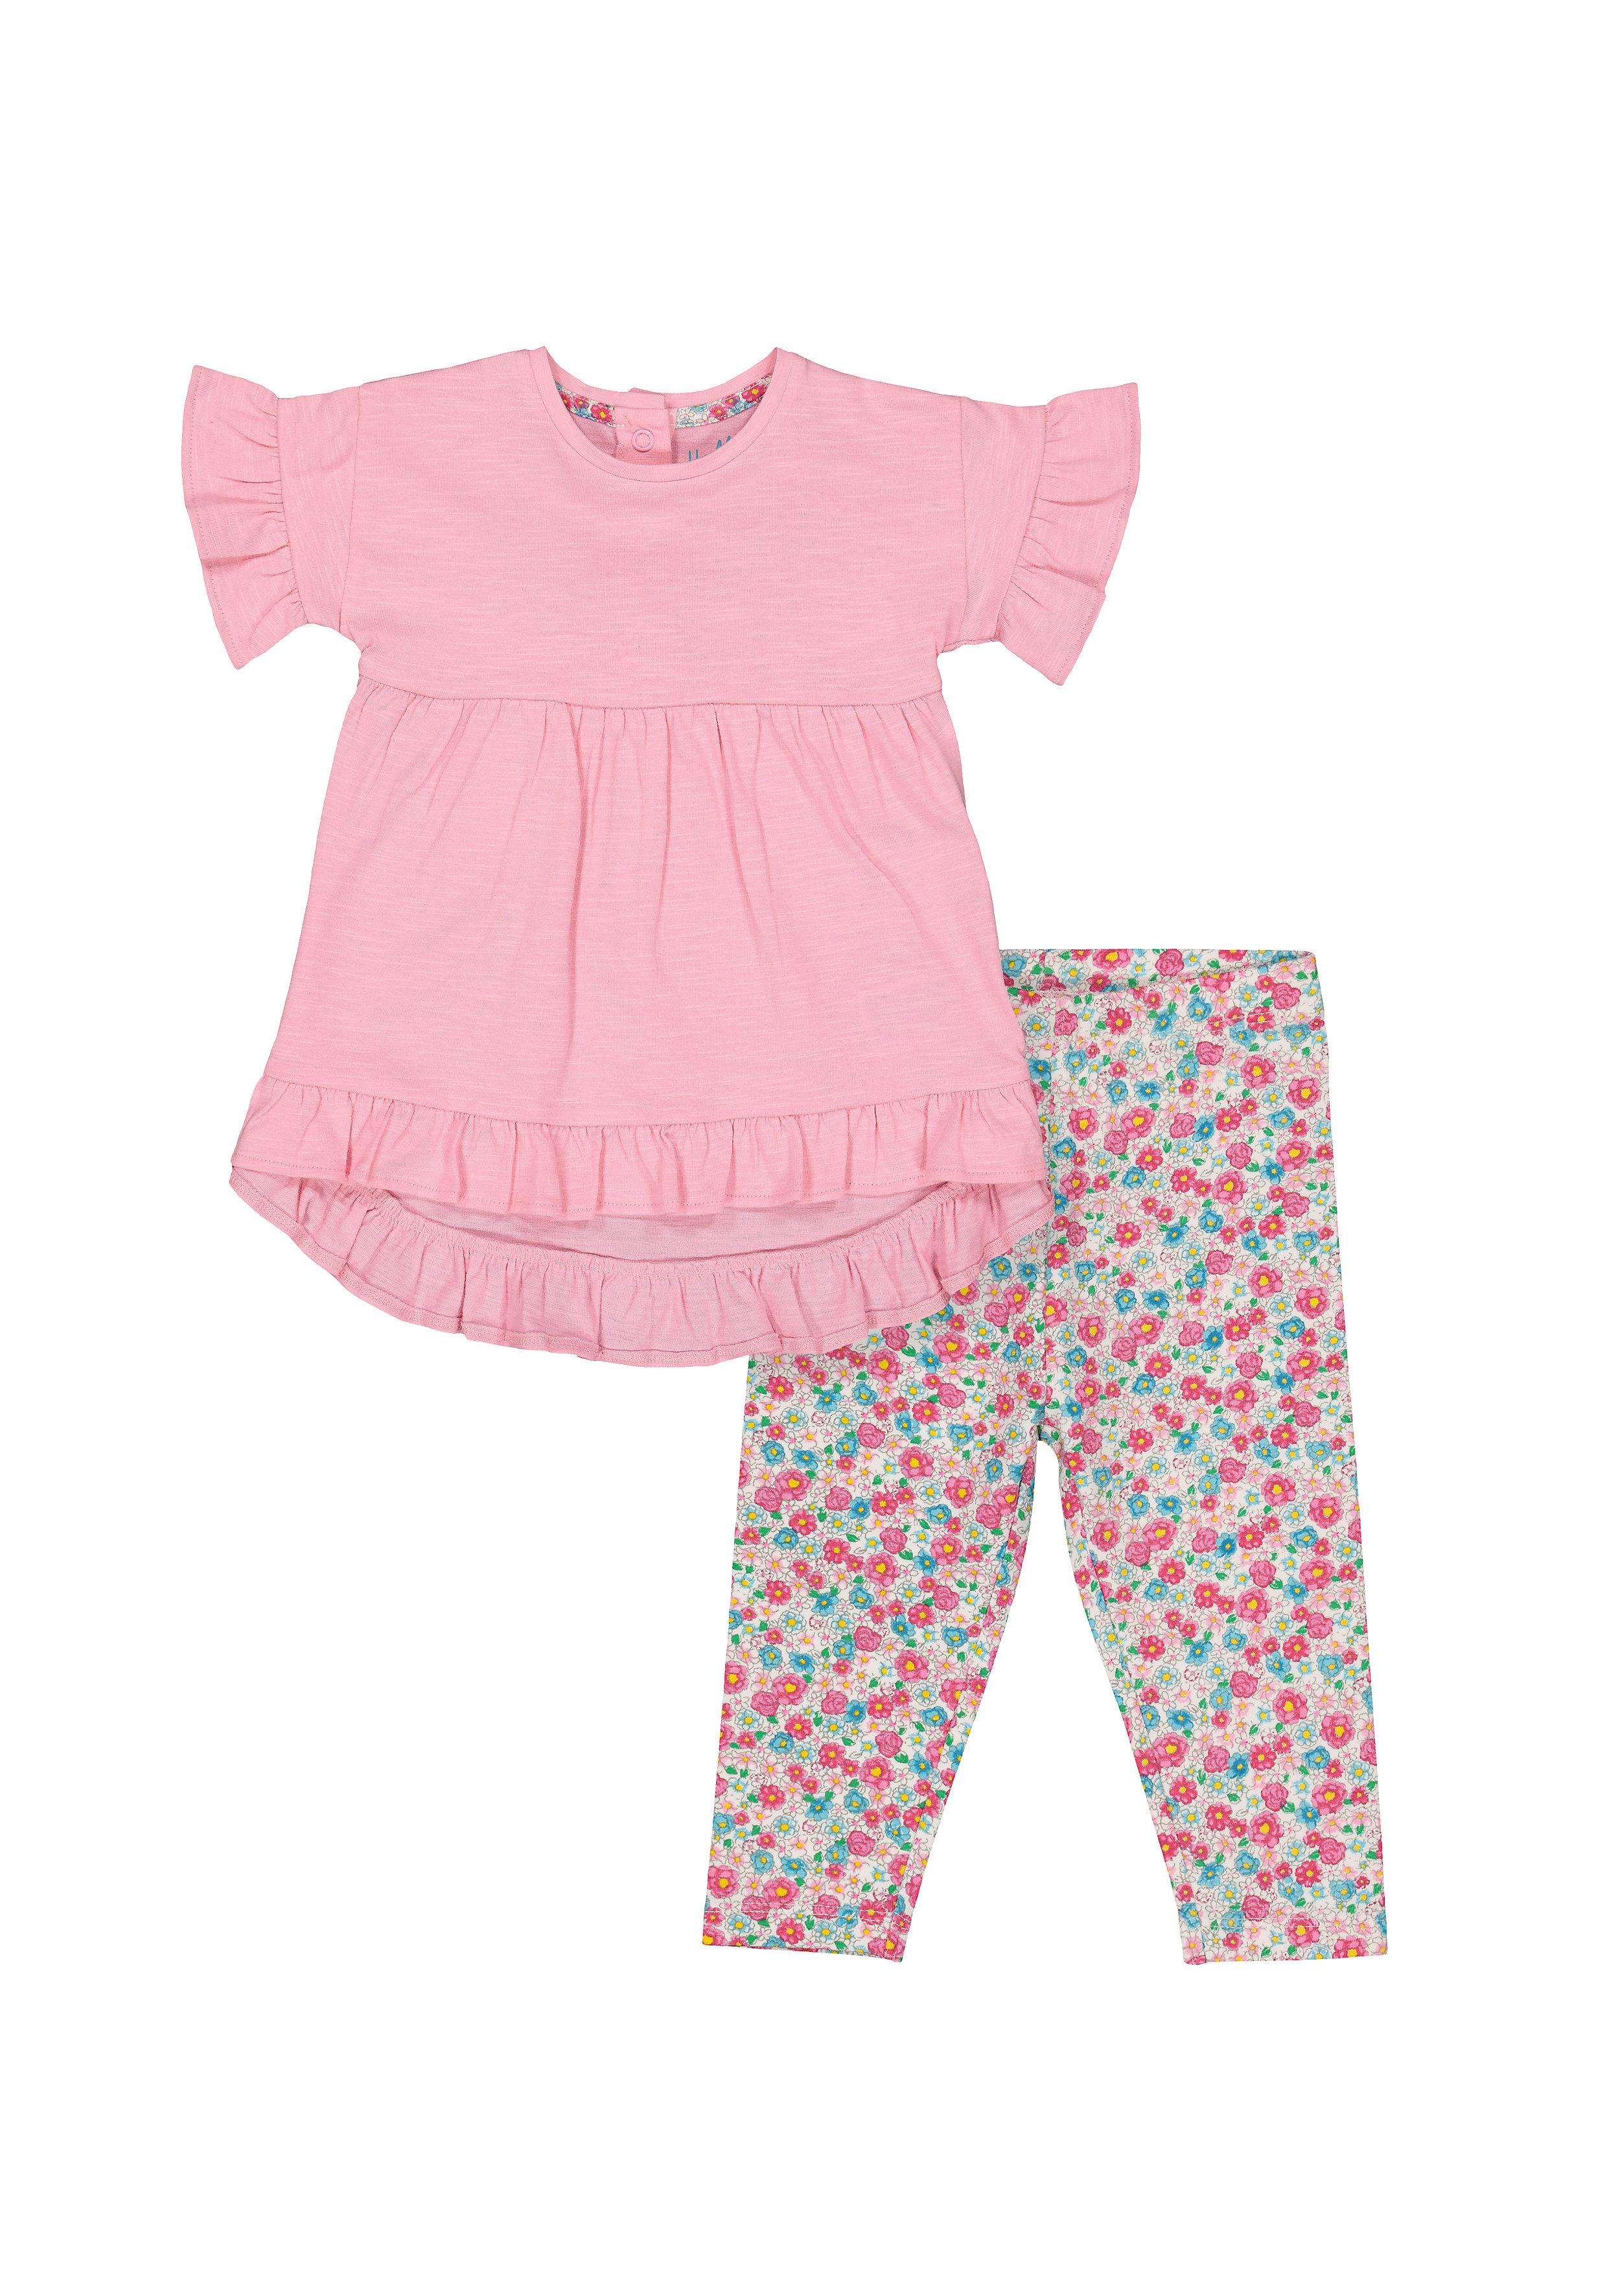 Mothercare   Girls Half Sleeves T-Shirt And Legging Set Floral Print - Pink